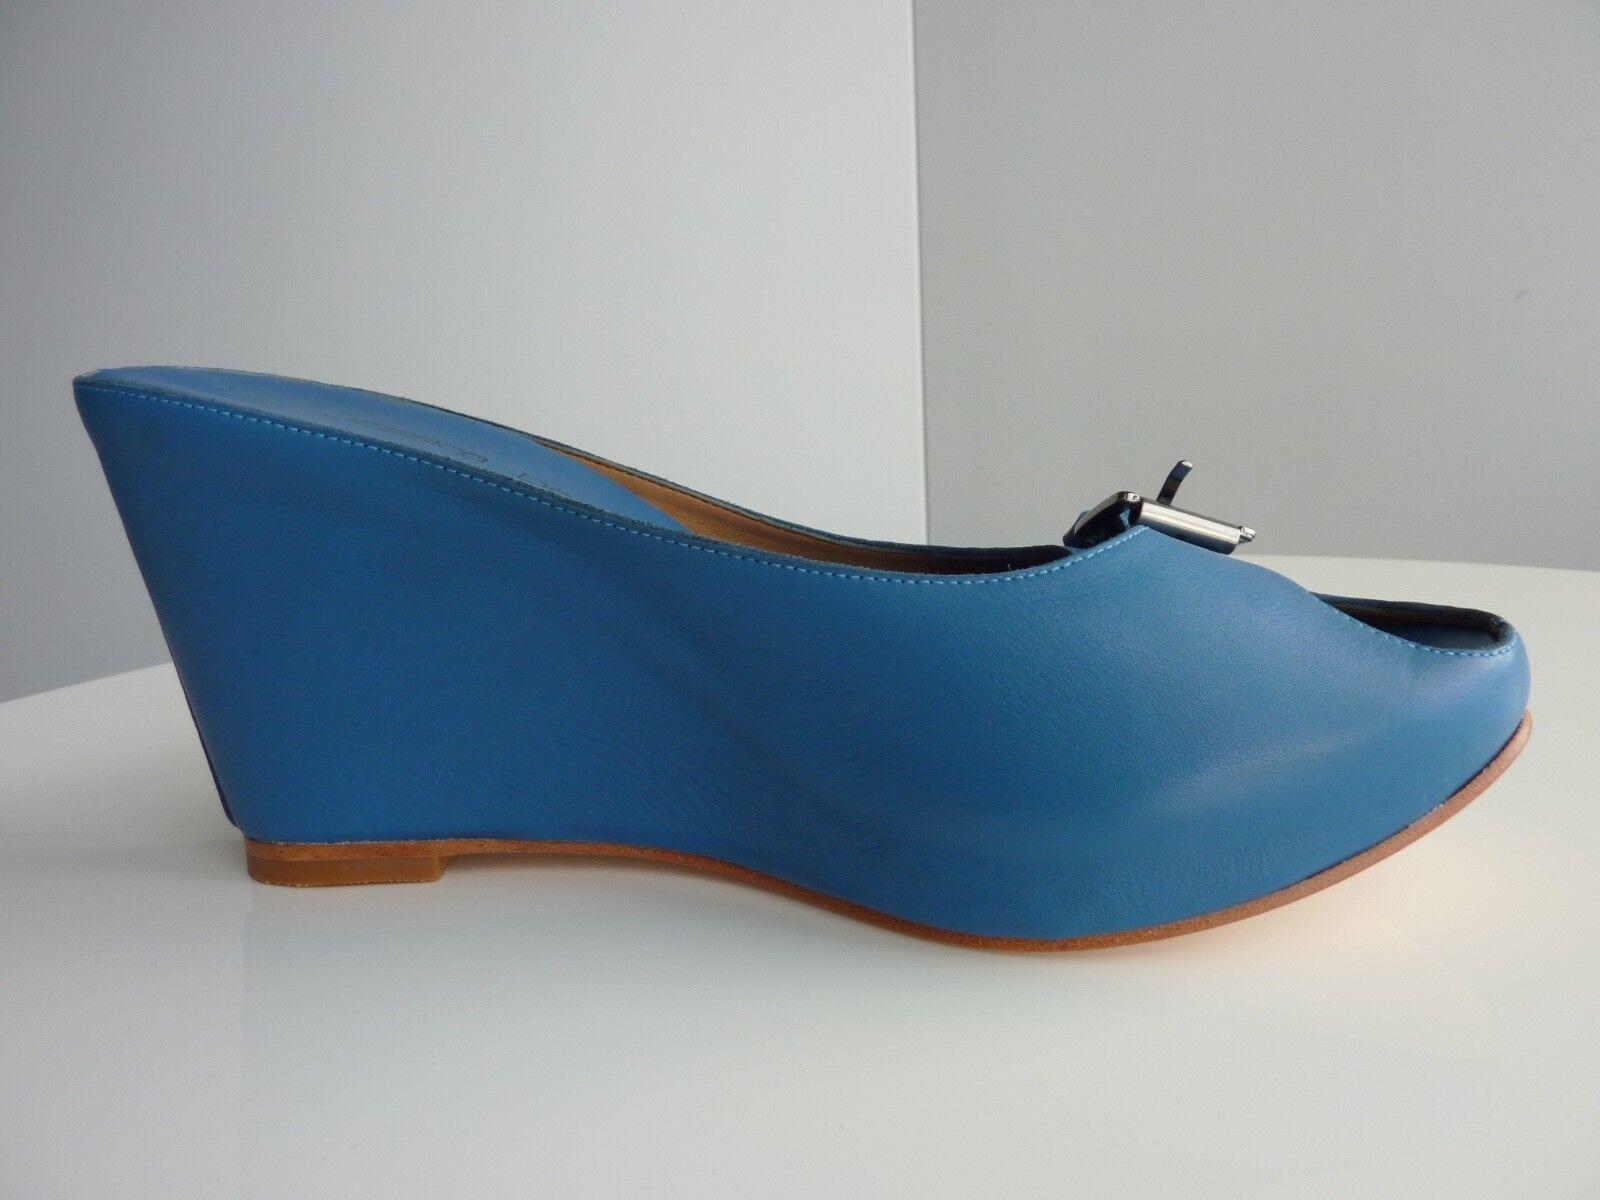 NEU Jessica Bennett Blau Peep Toe Leder Platform Wedge Heels EU39/US8.5 220